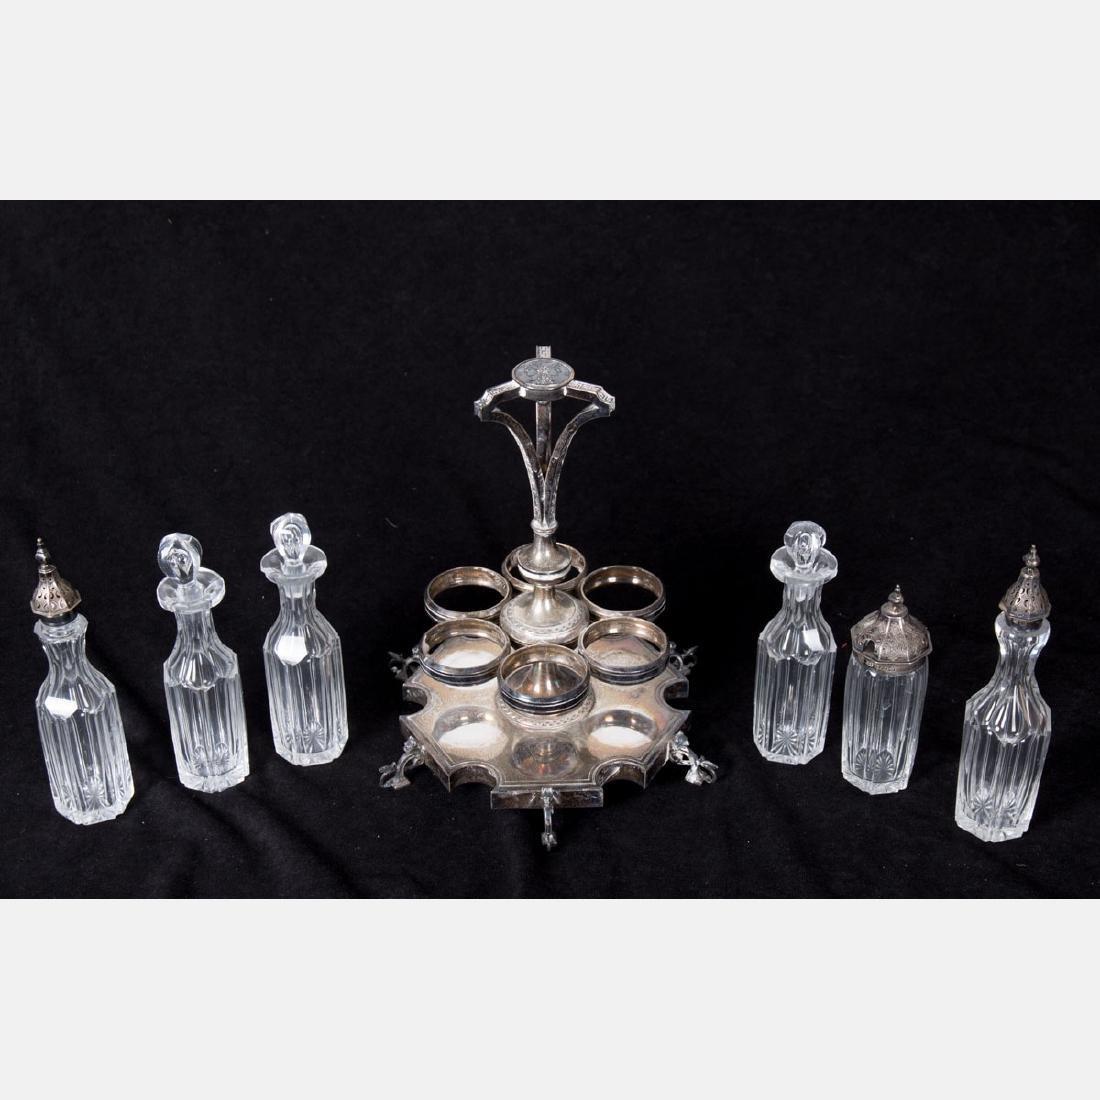 A Silverplated and Glass Cruet Set, 20th Century.